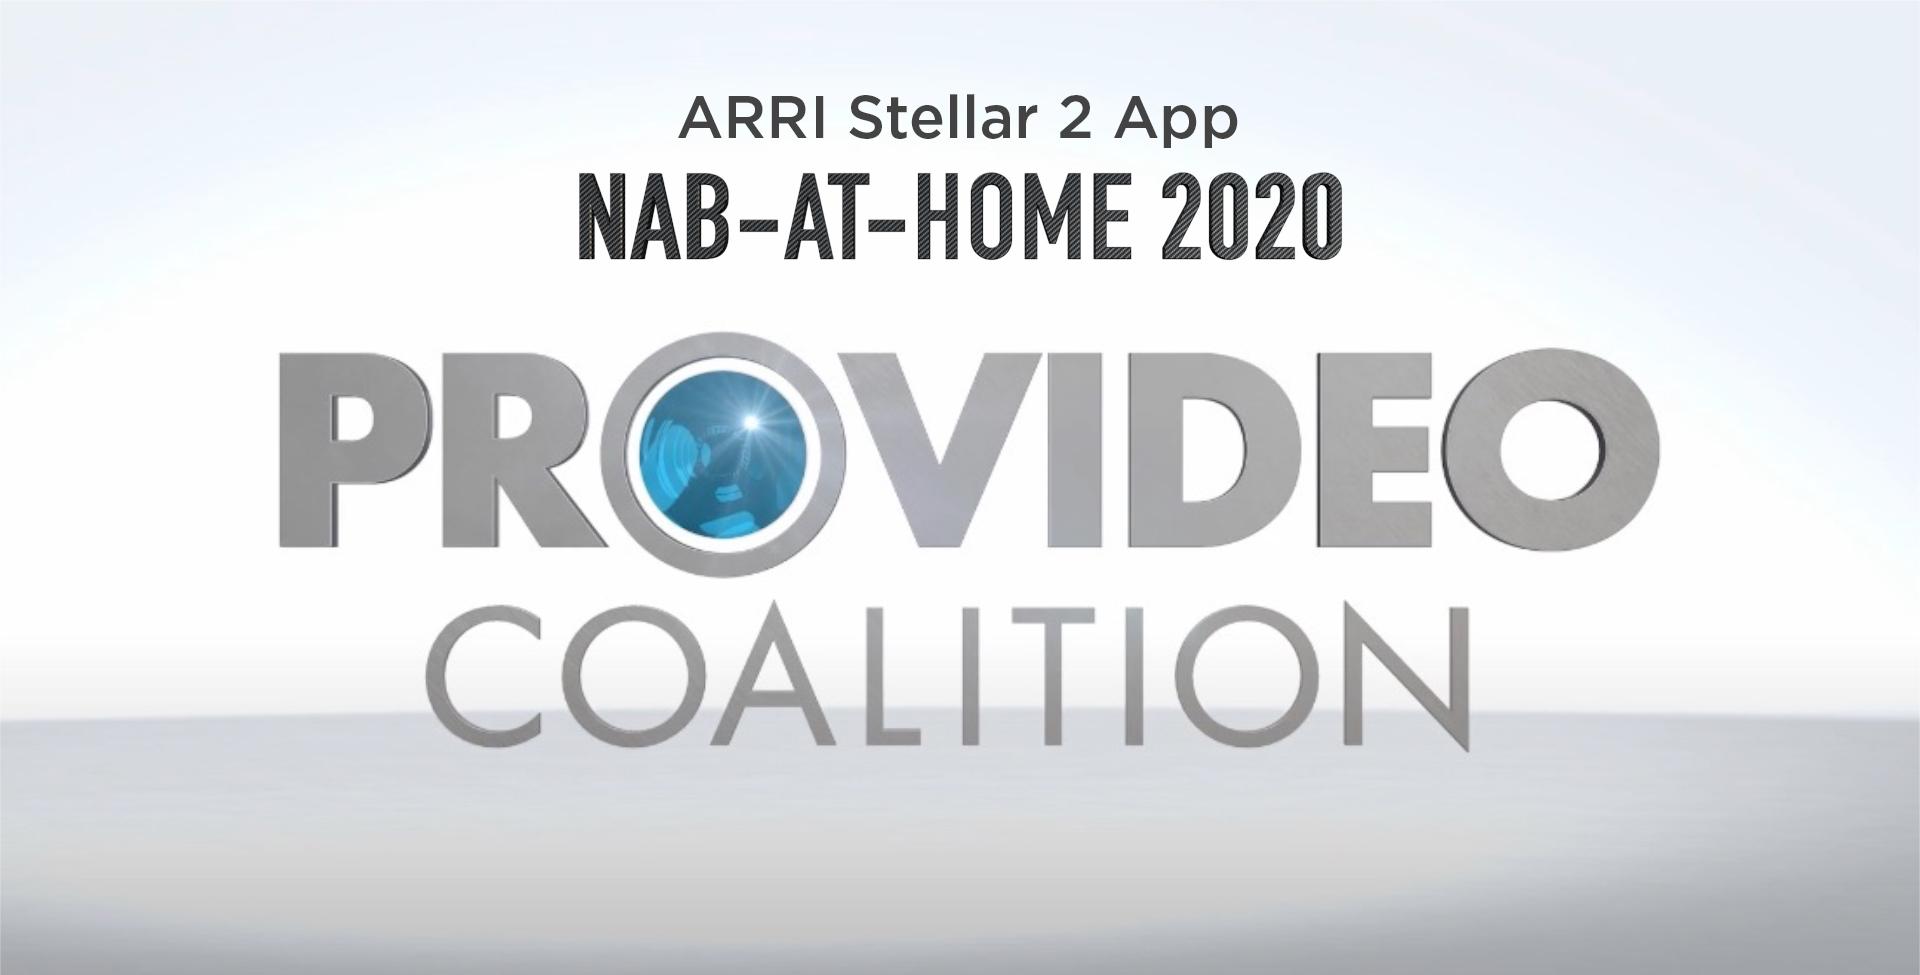 nab-at-home-2020-arri-stellar-2